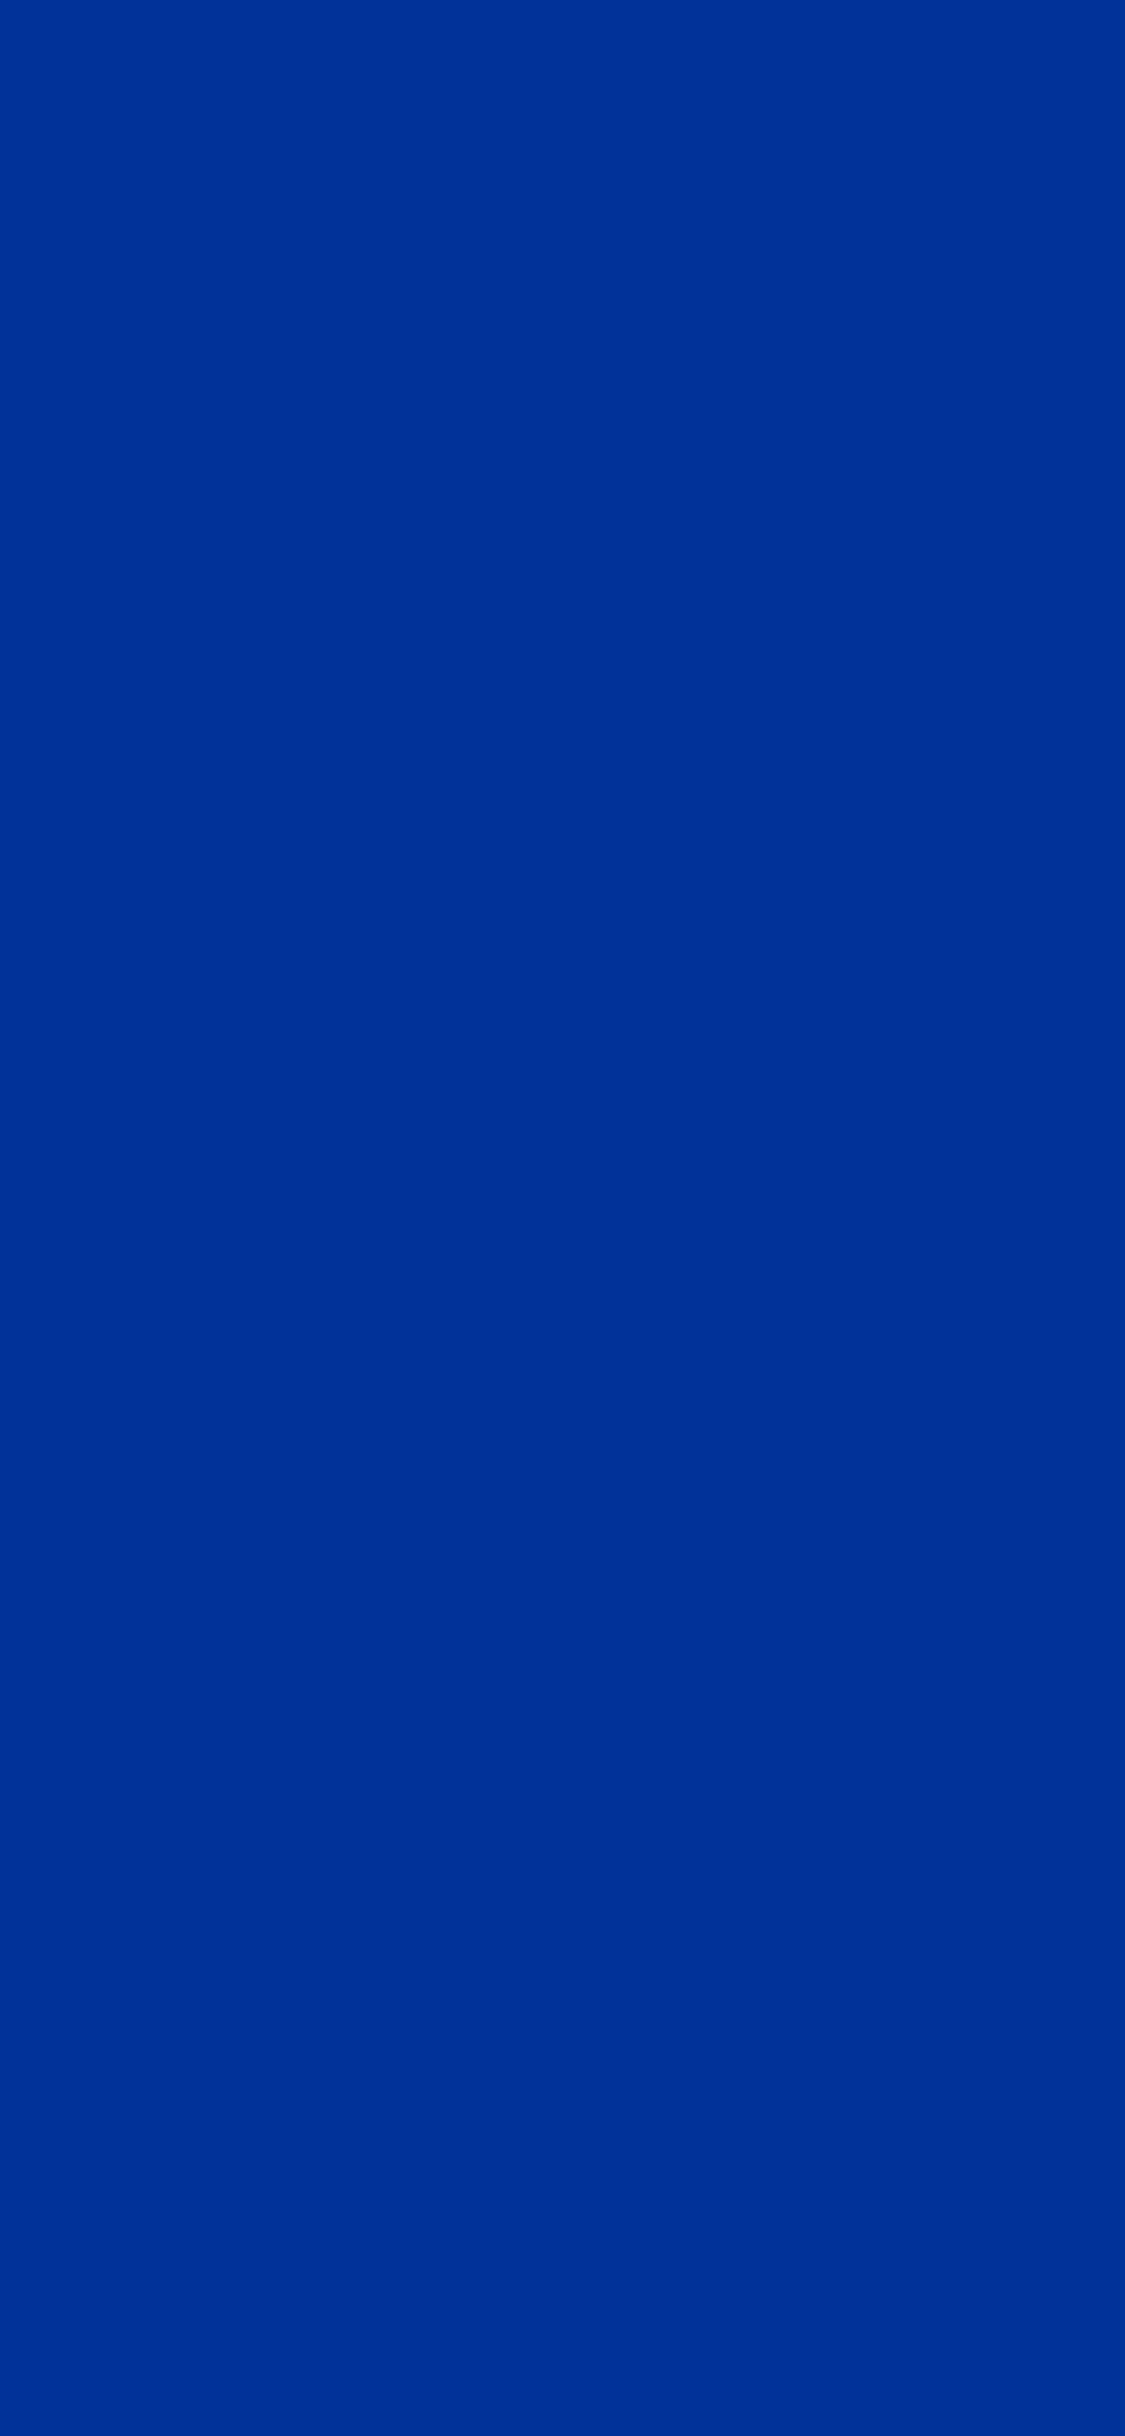 1125x2436 Smalt Dark Powder Blue Solid Color Background